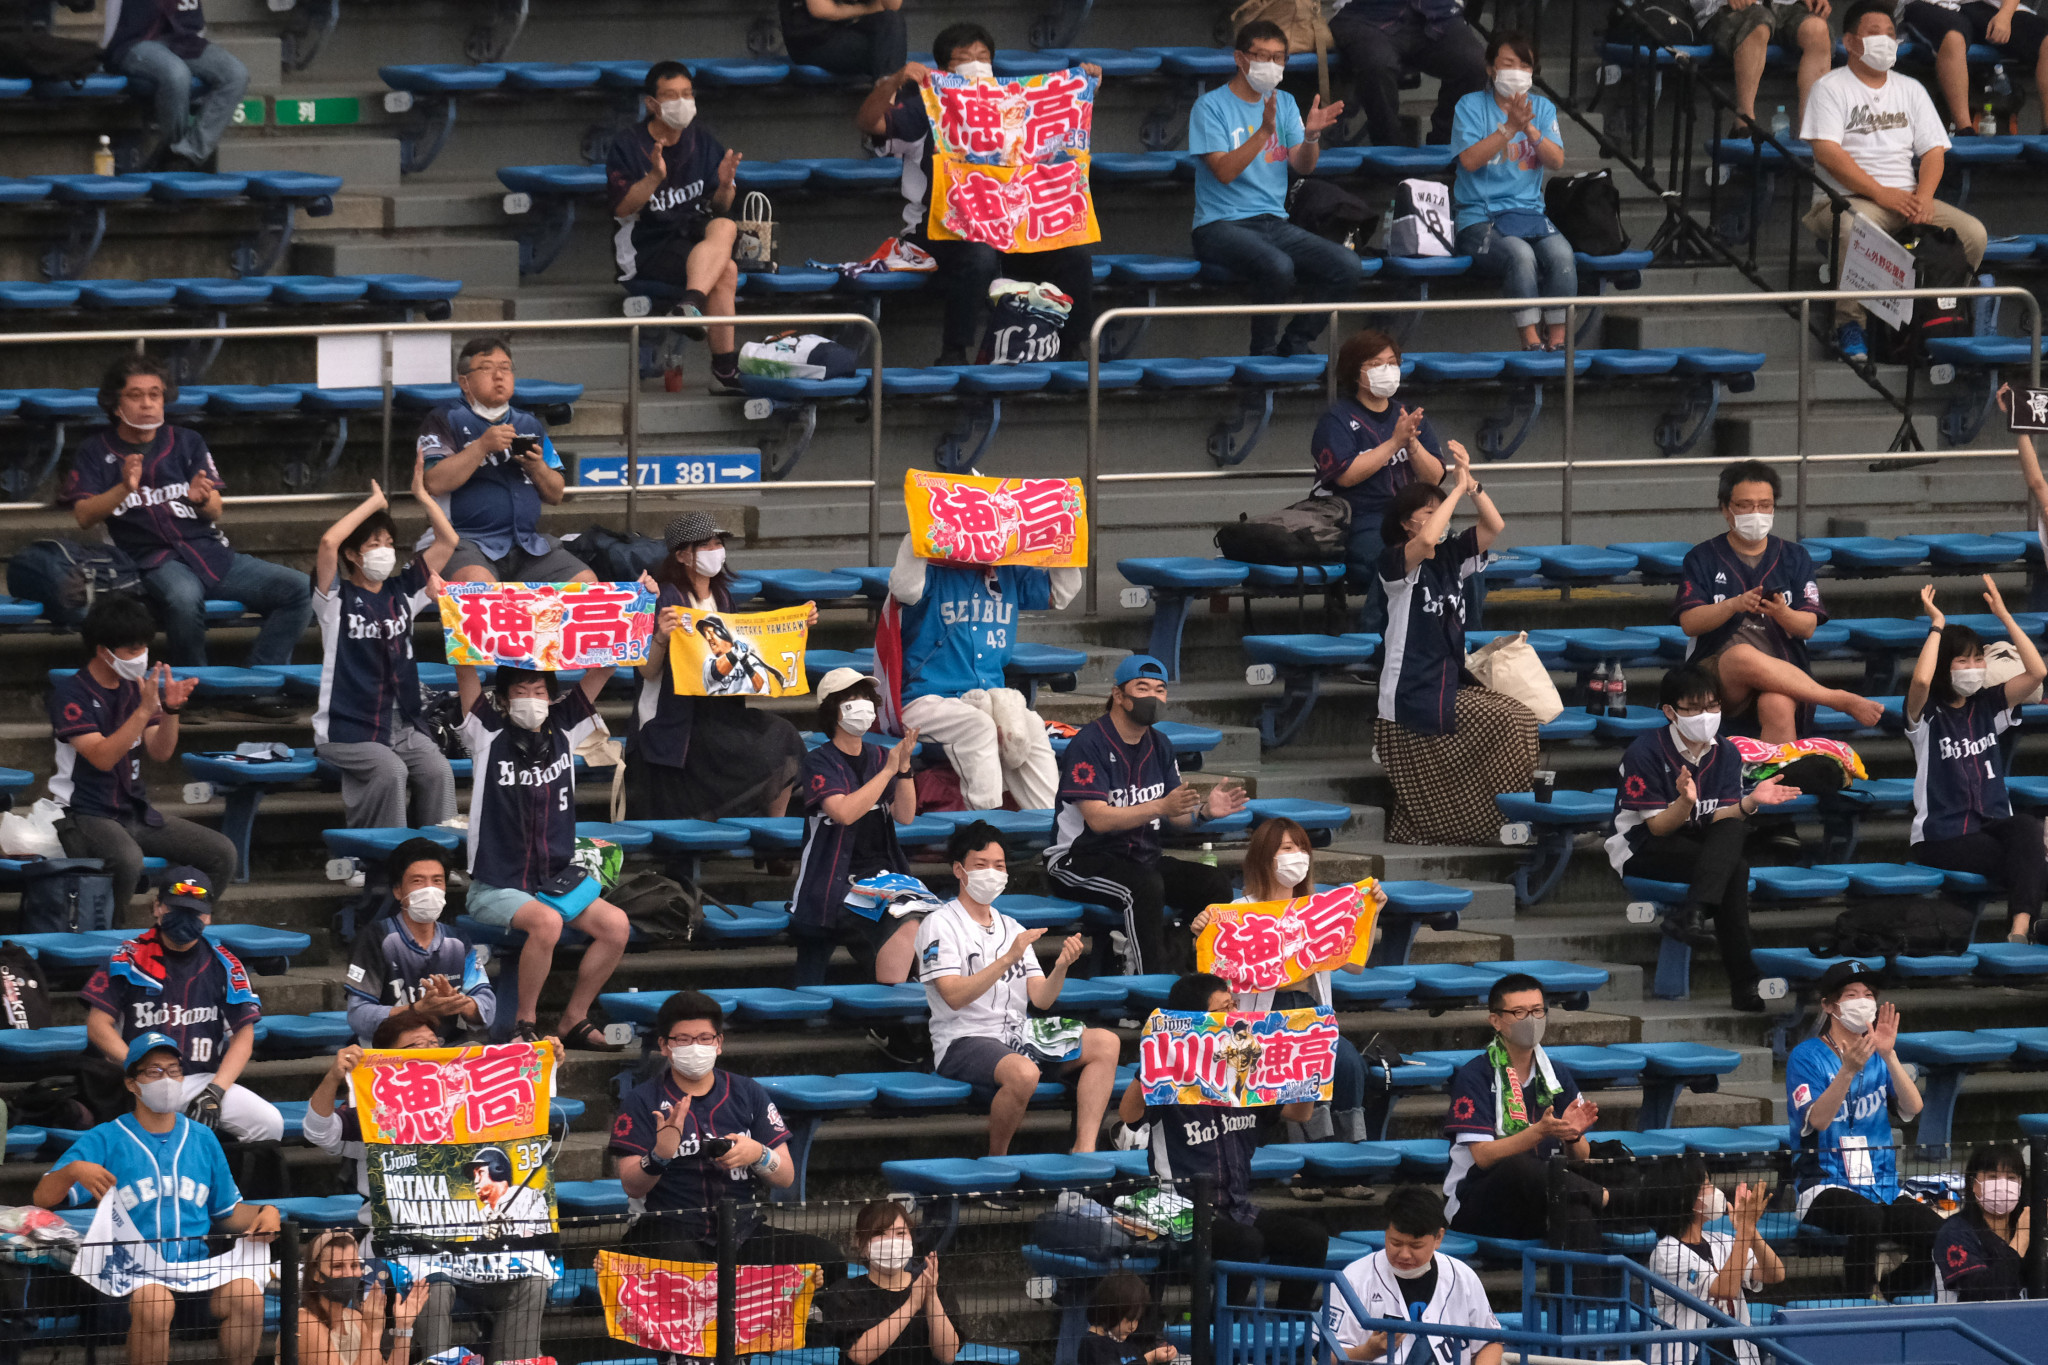 Espectadores asisten a actividades deportivas mientras Japón alivia medidas